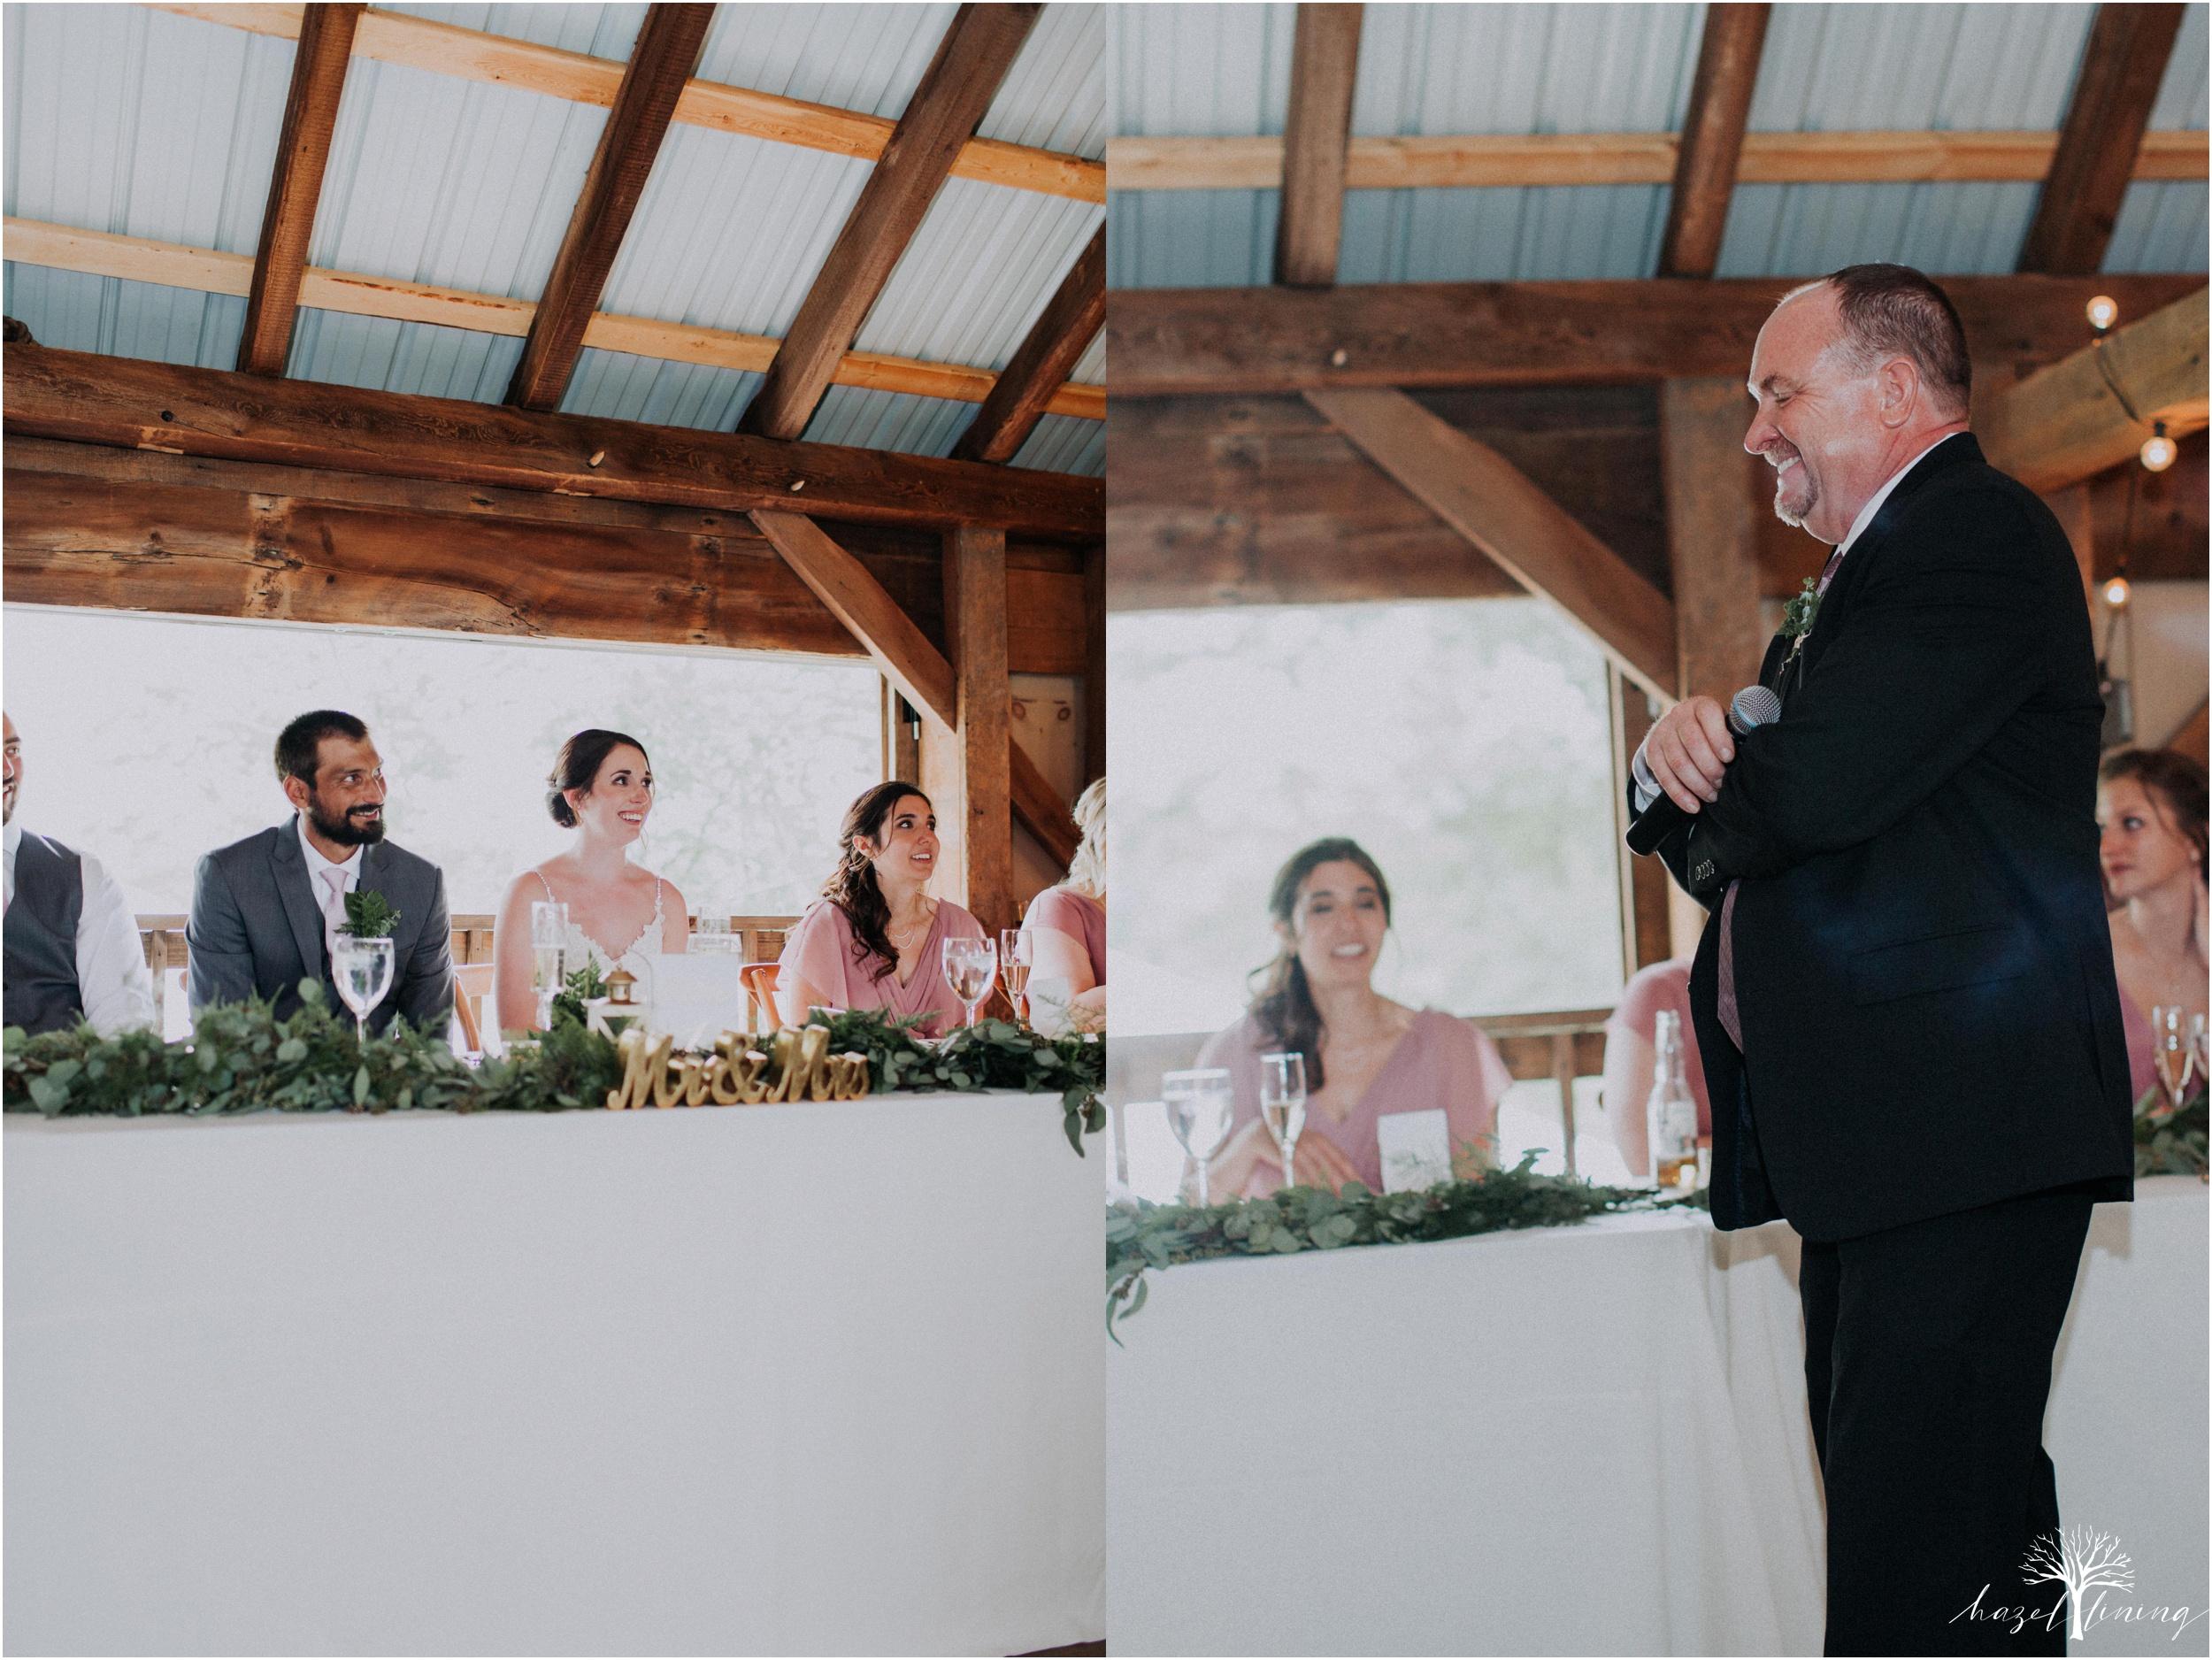 hazel-lining-travel-wedding-elopement-photography-lisa-landon-shoemaker-the-farm-bakery-and-events-bucks-county-quakertown-pennsylvania-summer-country-outdoor-farm-wedding_0120.jpg